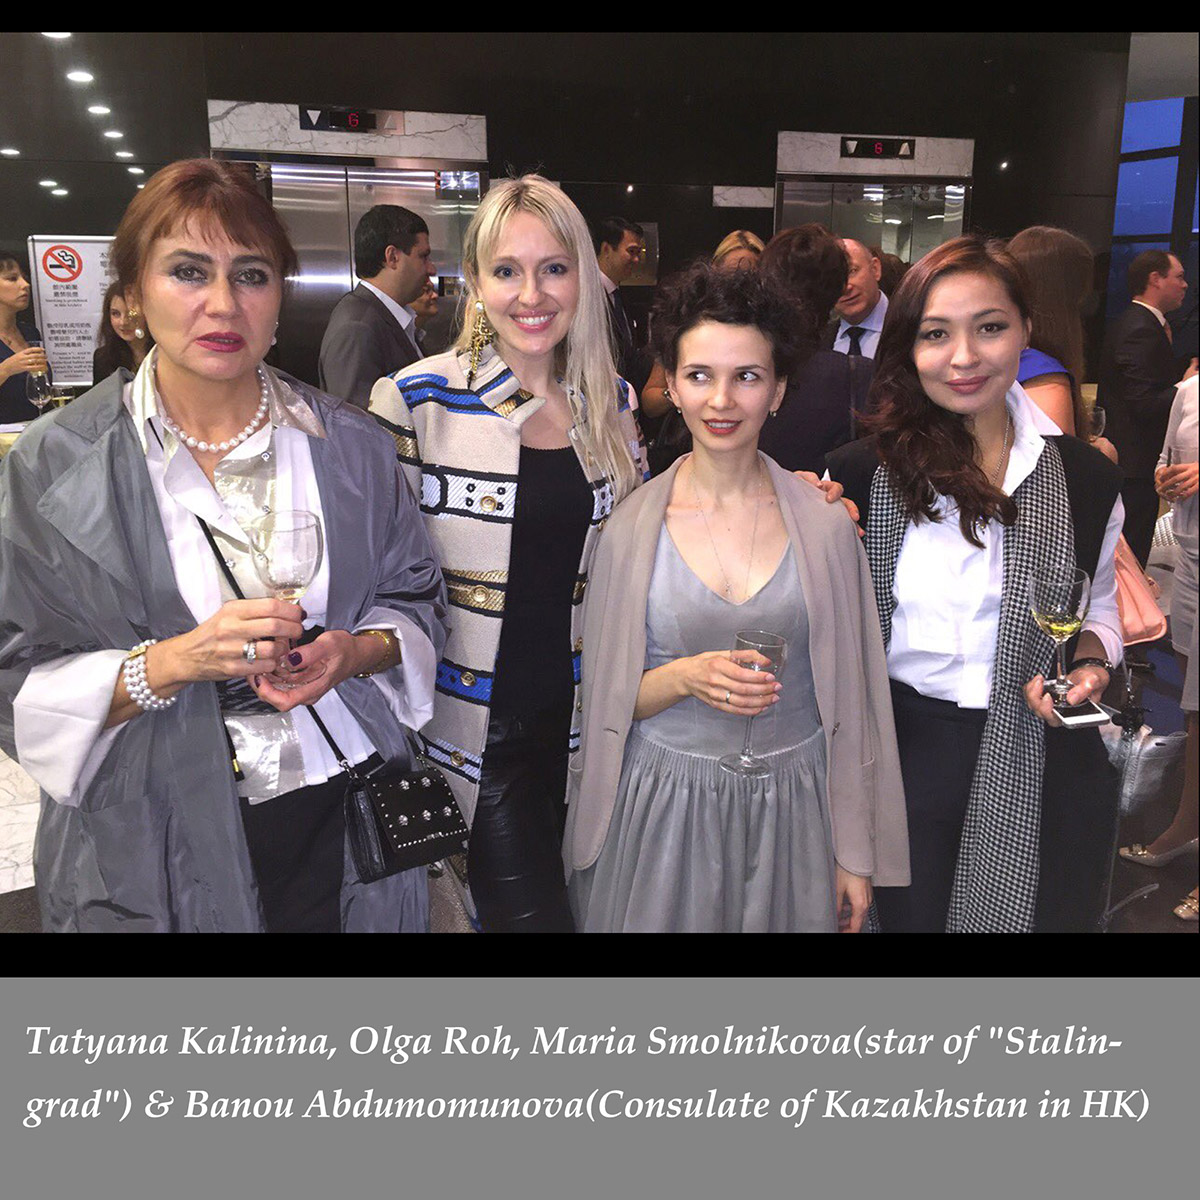 Tatyana-Kalinina-Olga-Roh-Maria-Smolnikova-star-of-Stalingrad--Banou-Abdumomunova